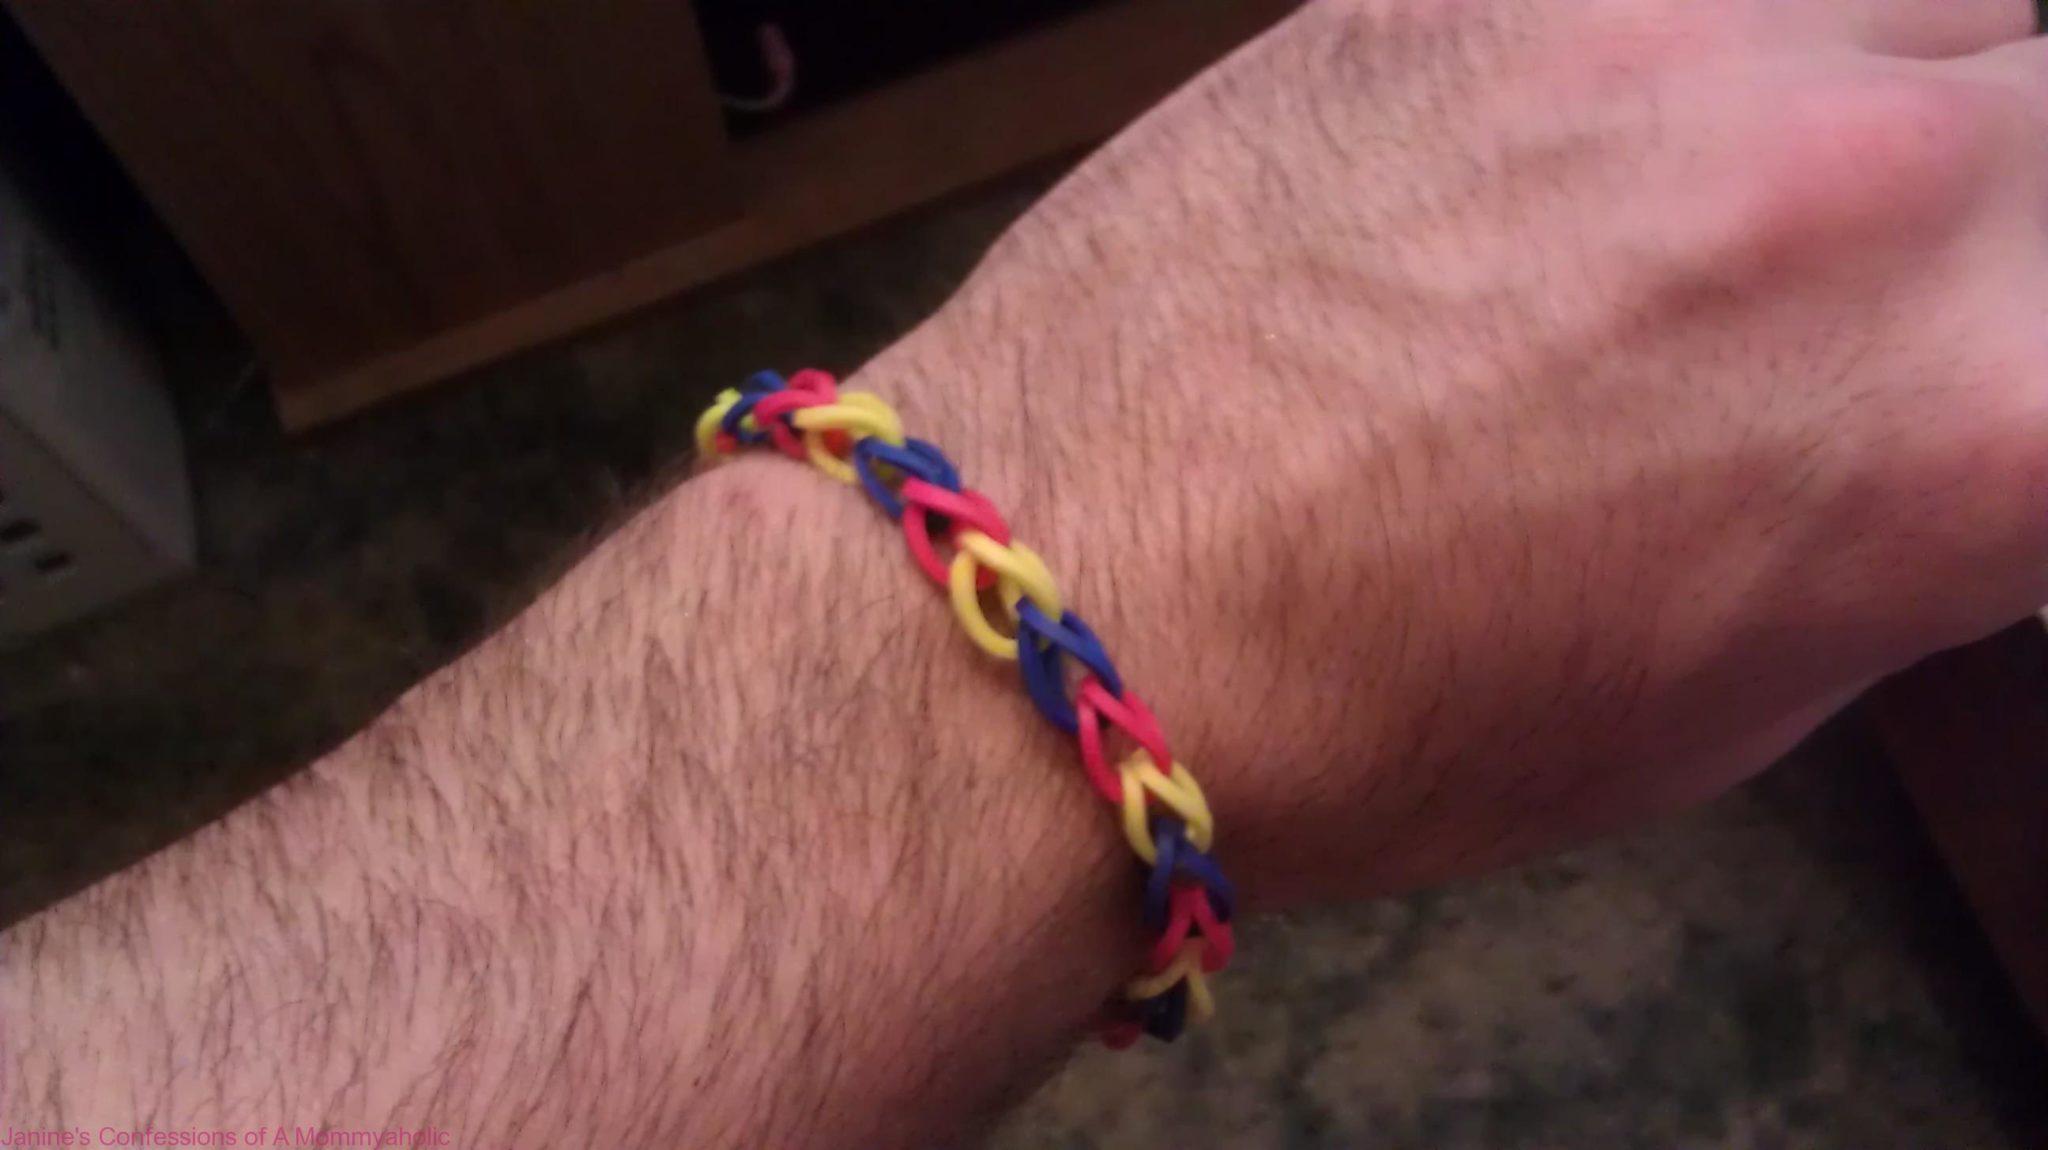 Rubber Band Bracelets The Latest Kids Craze Confessions